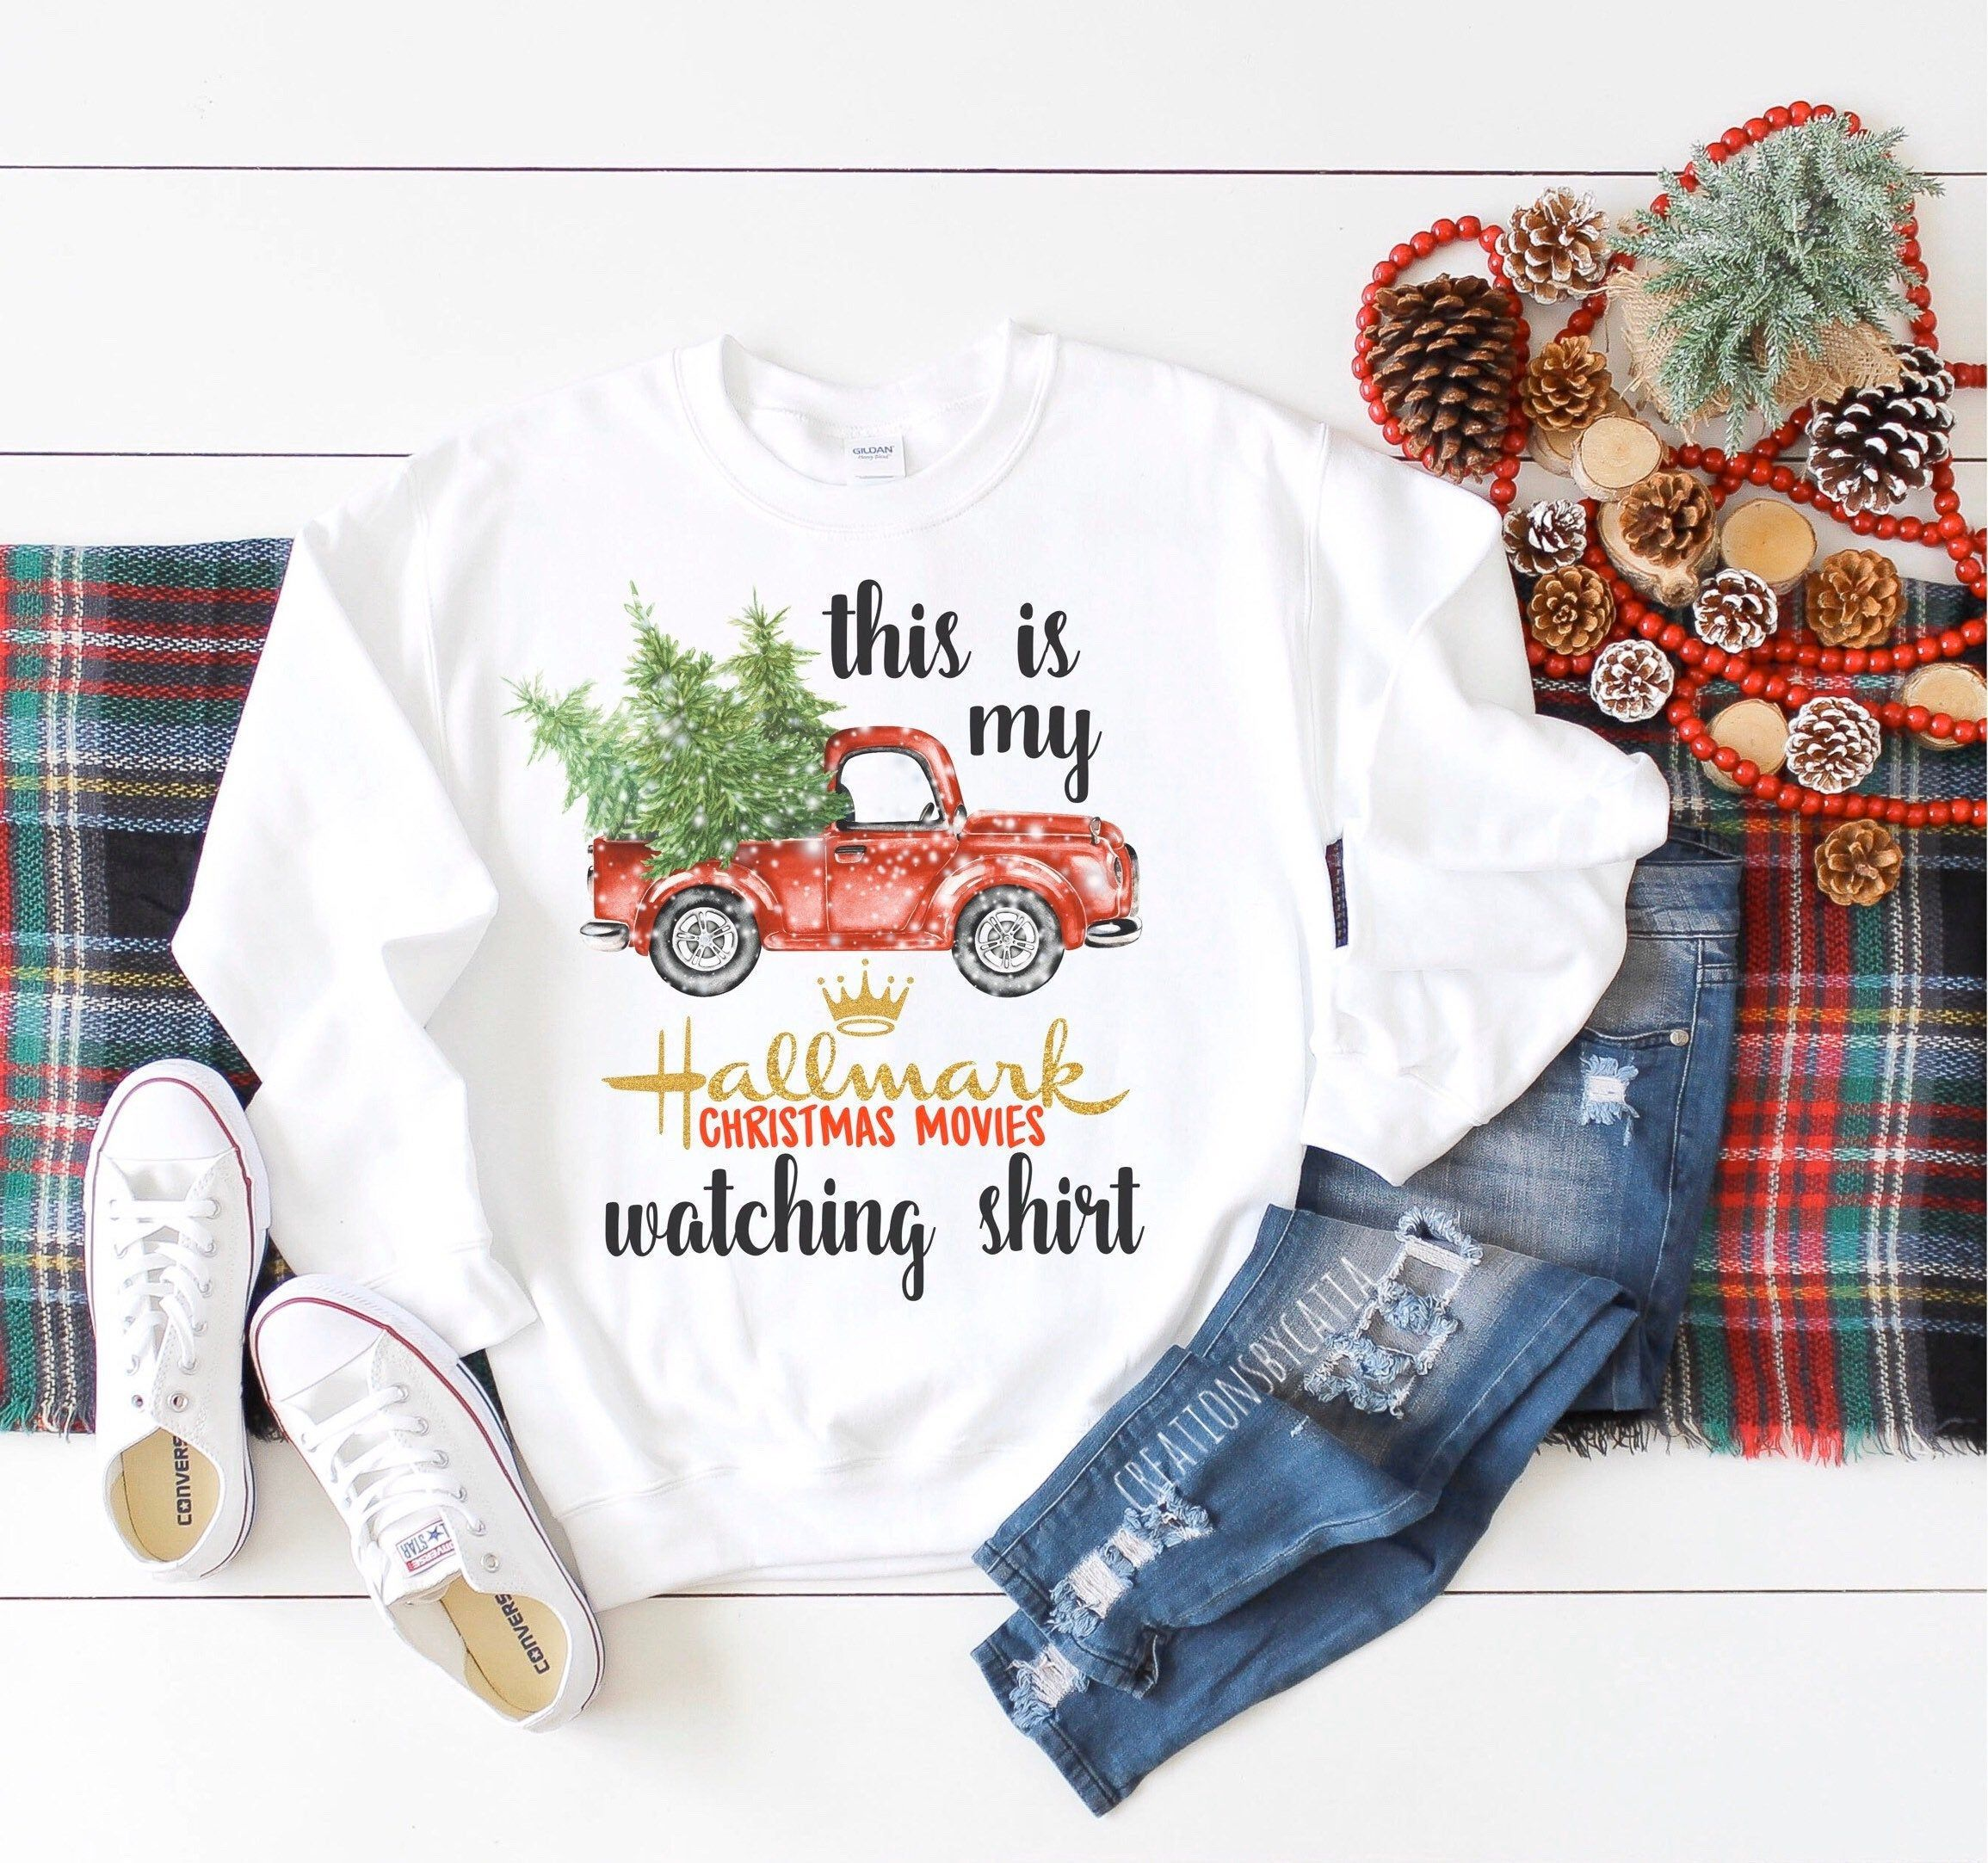 Hallmark Christmas Sweater, This Is My Hallmark Christmas